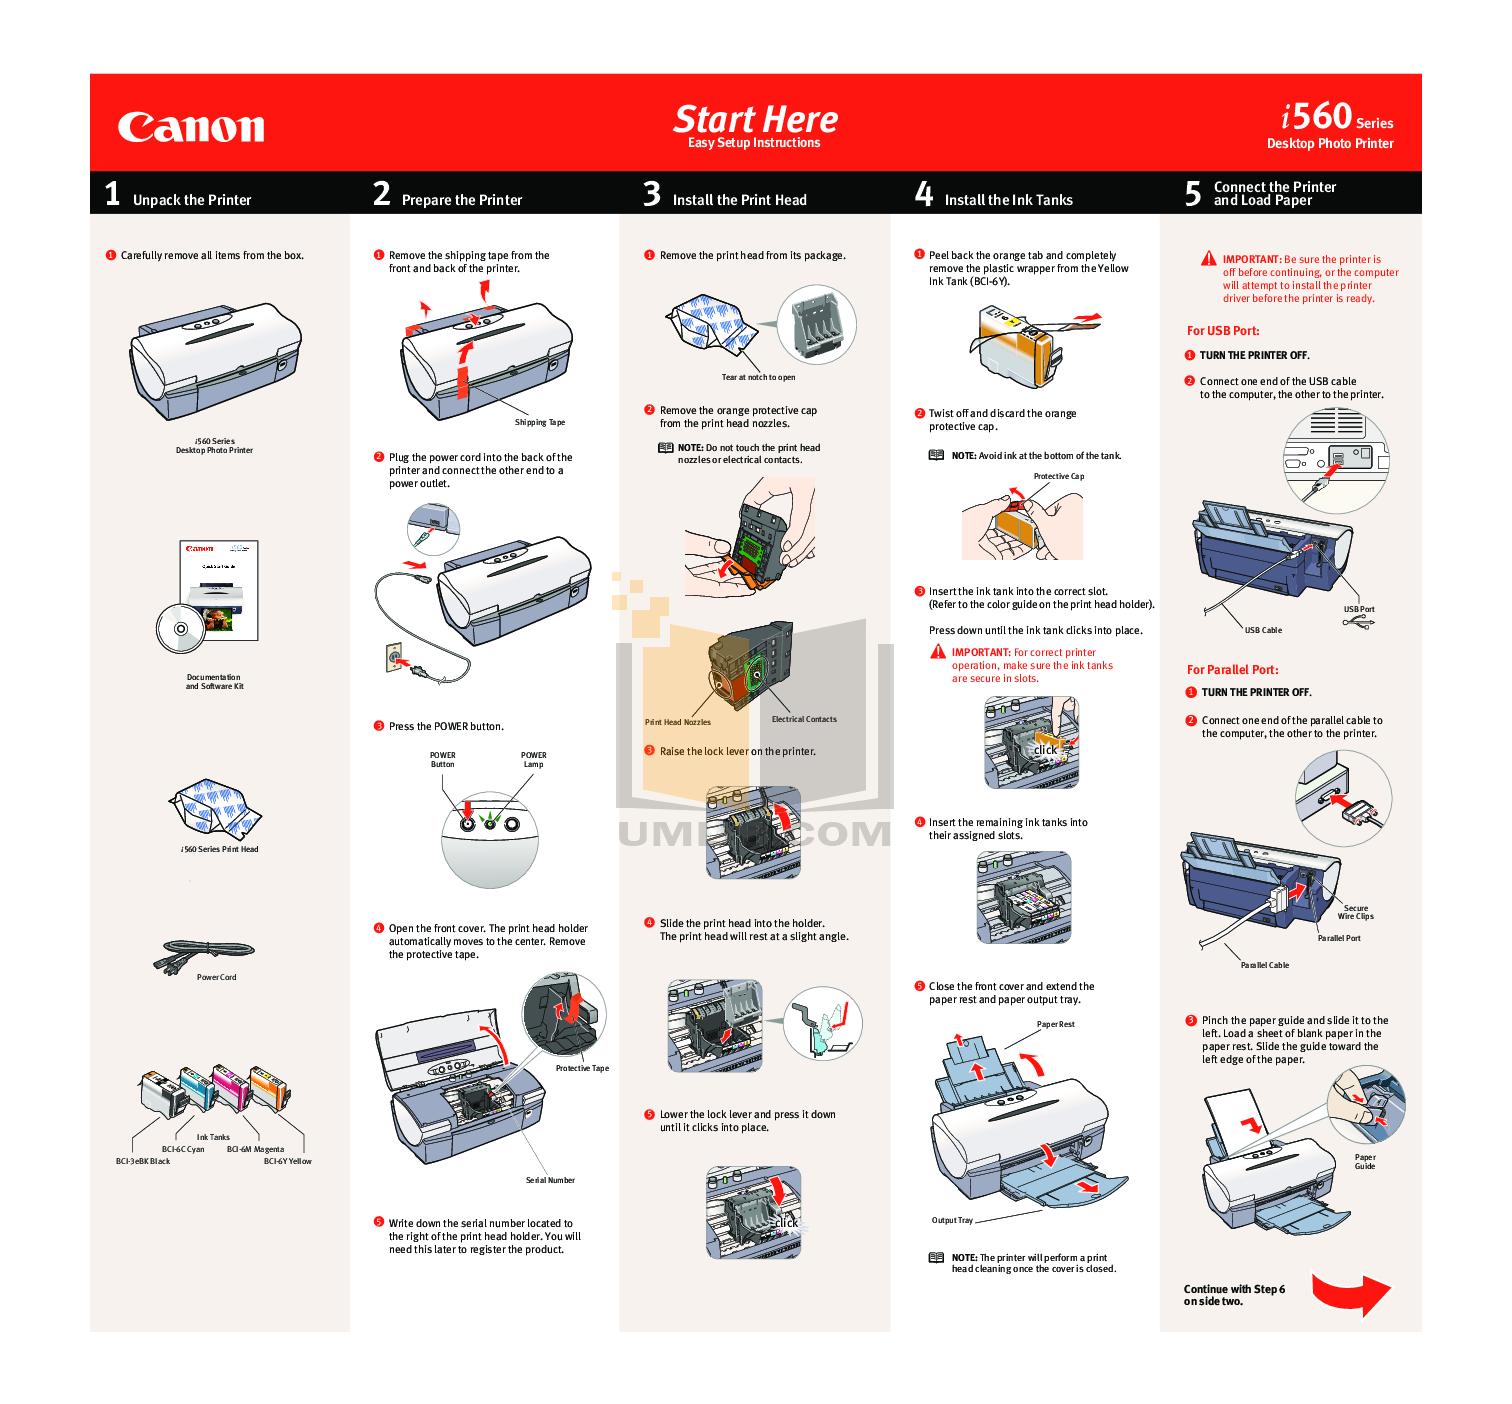 pdf for Canon Printer i560 manual